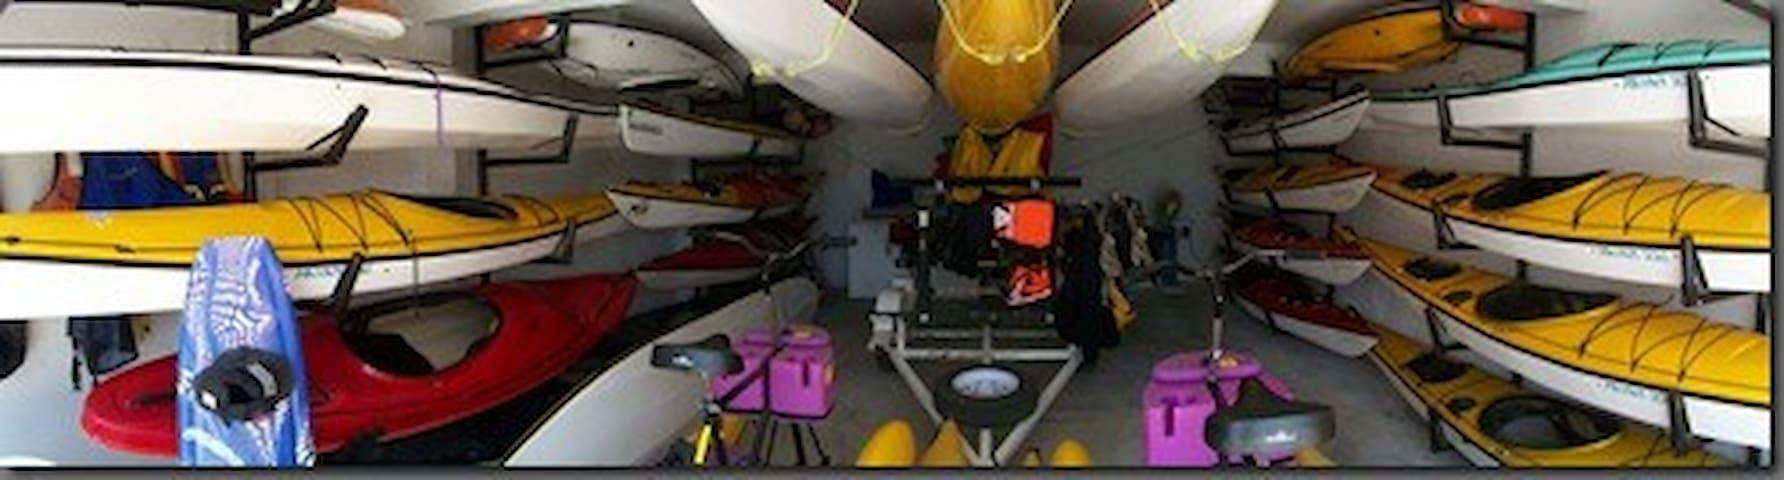 Big watersports & Kayak Clubhouse Veracruz